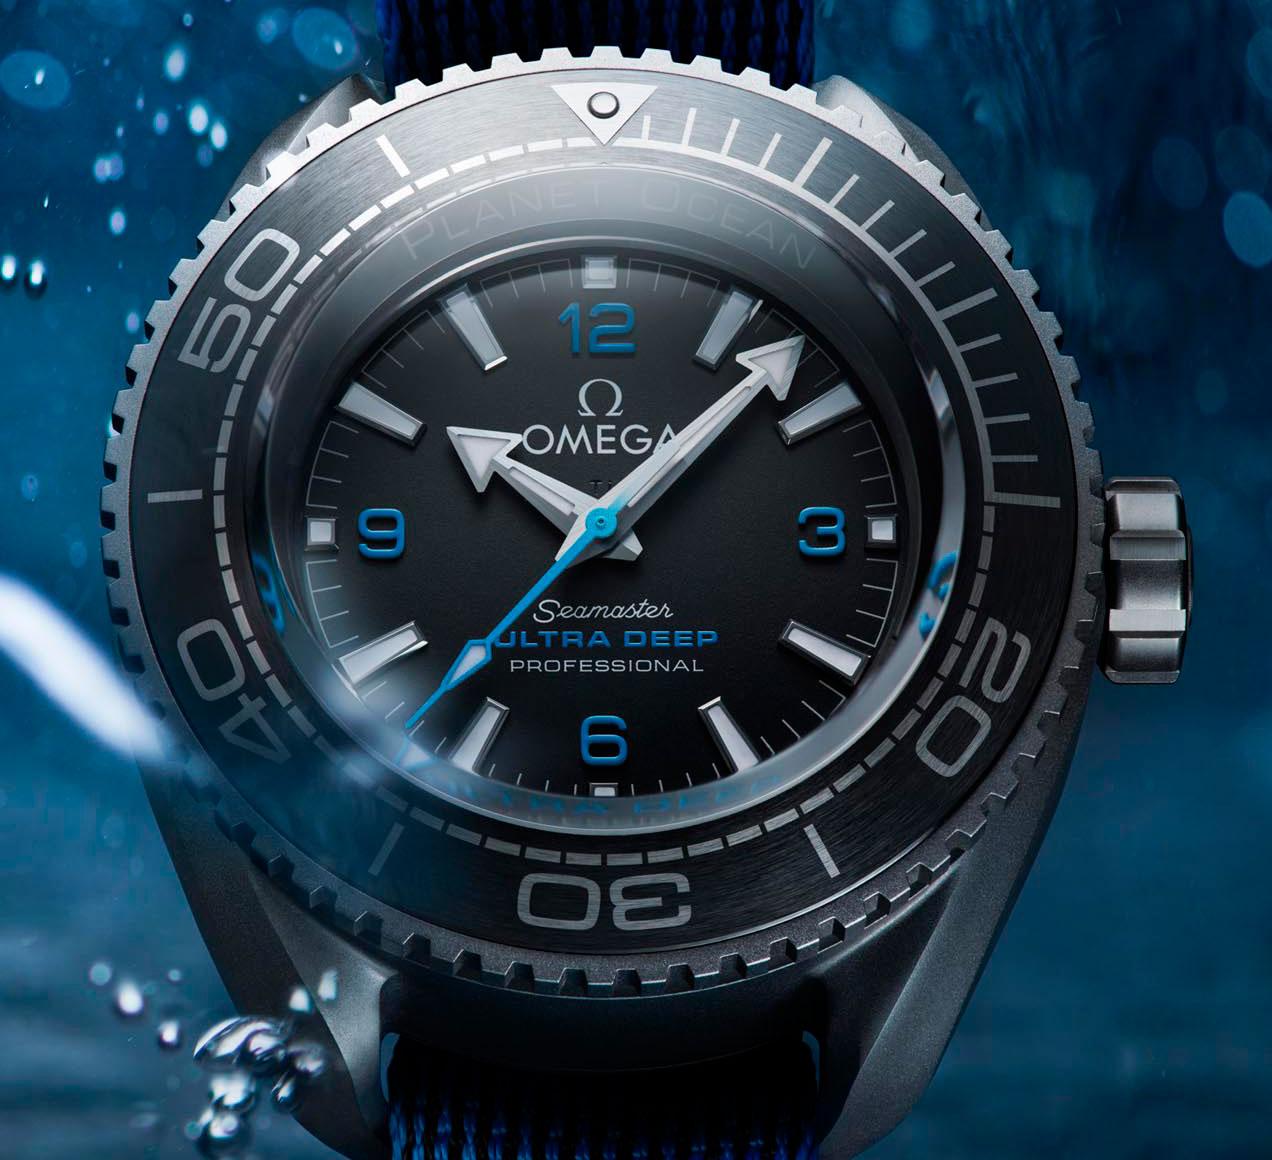 Esfera del Omega Seamaster Planet Ocean Ultra Deep Professional